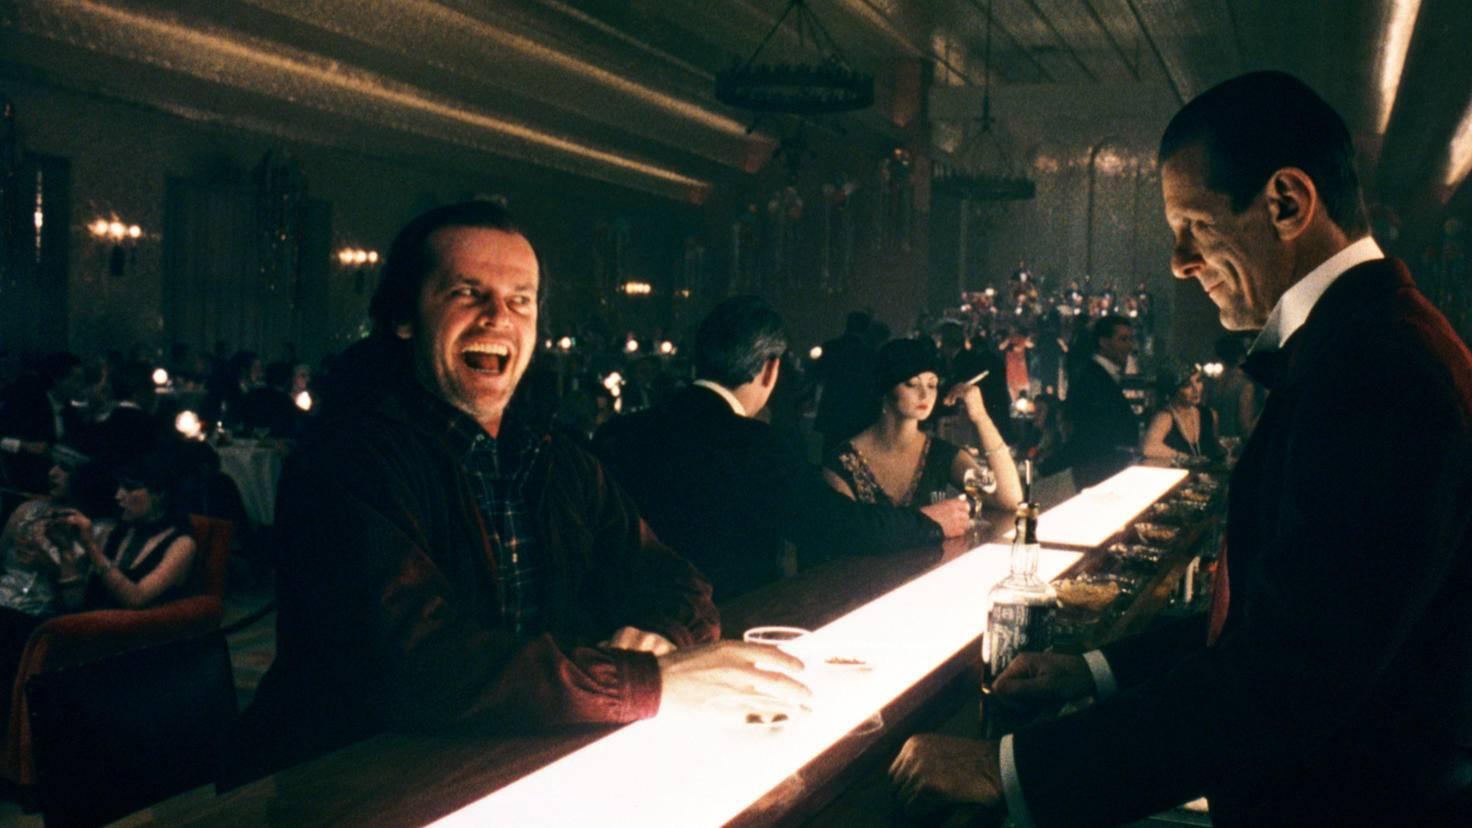 The-Shining-Jack-Nicholson-Bar